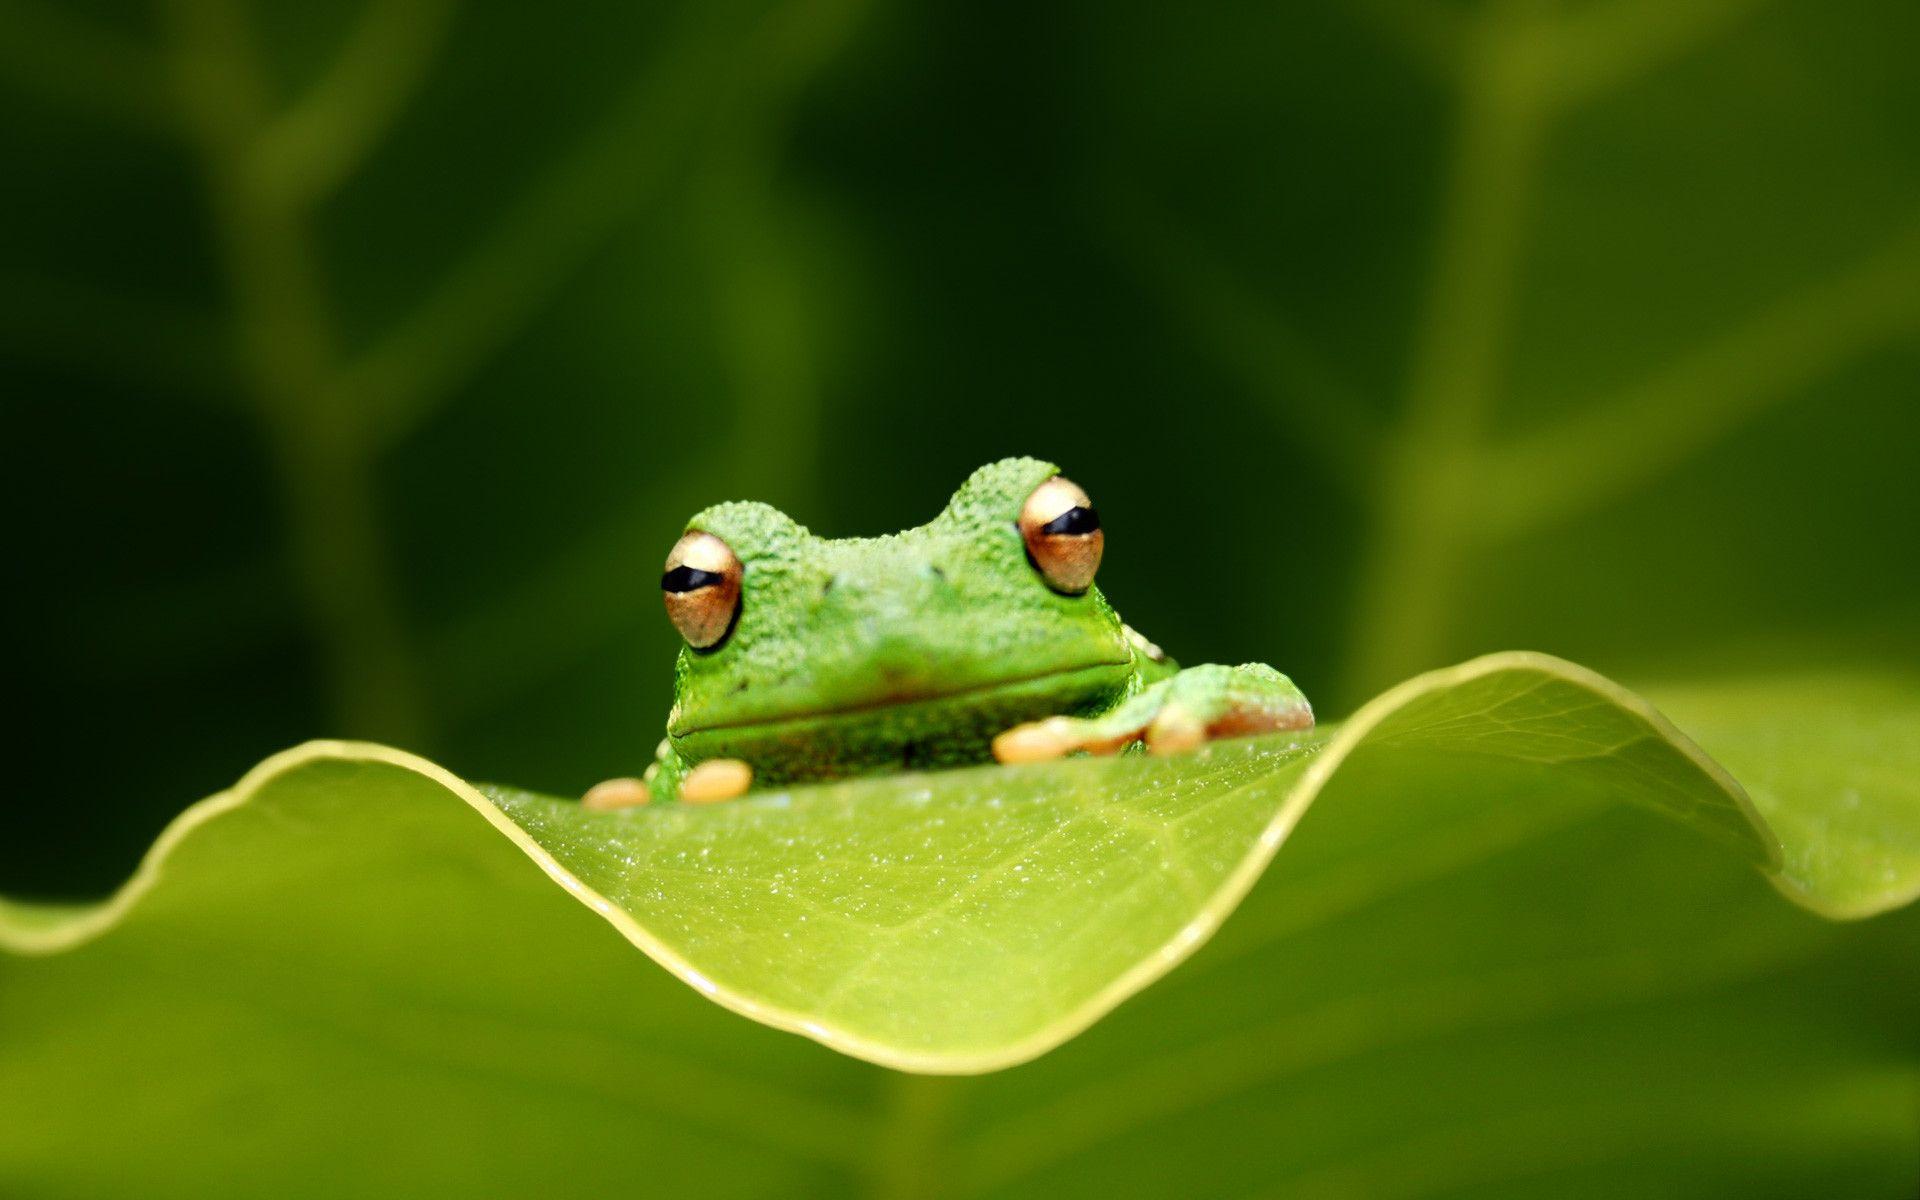 Kermit The Frog Computer Wallpapers On Wallpaperdog